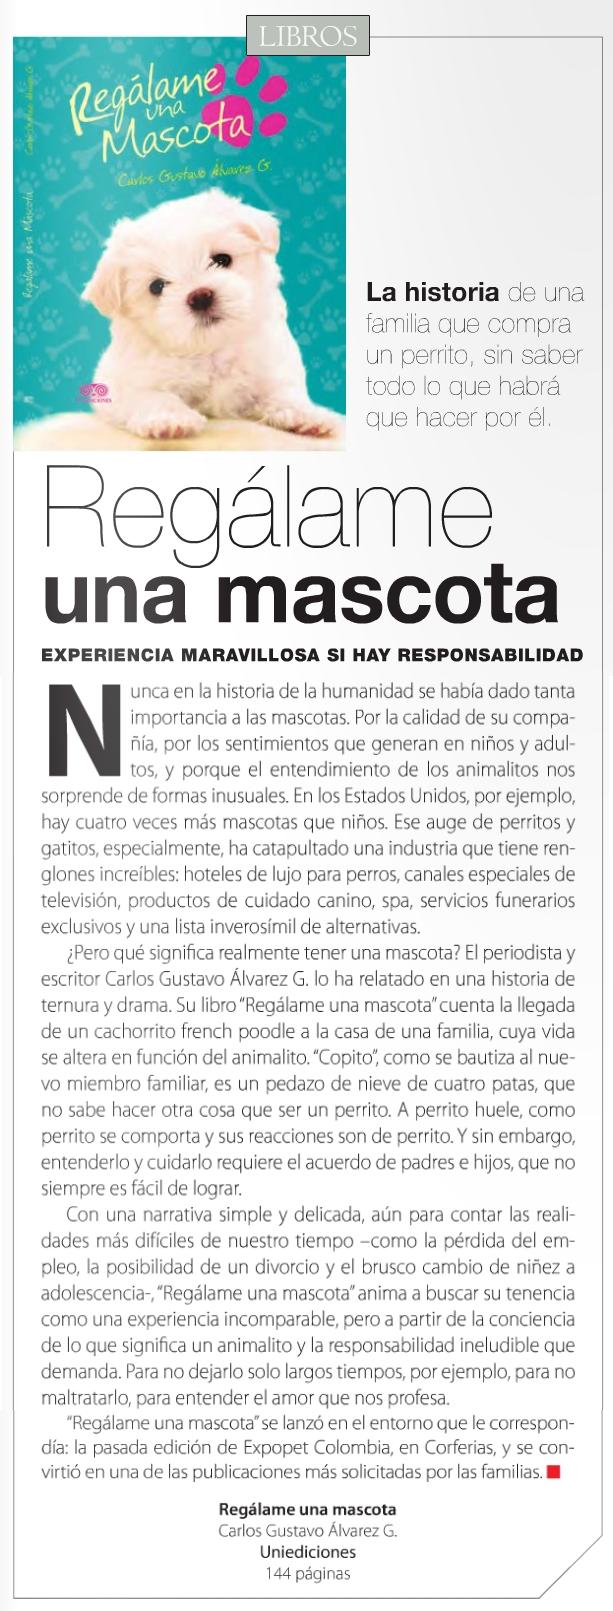 Revista Momentos, Edicion No. 17, Marzo de 2015, Pg. 23